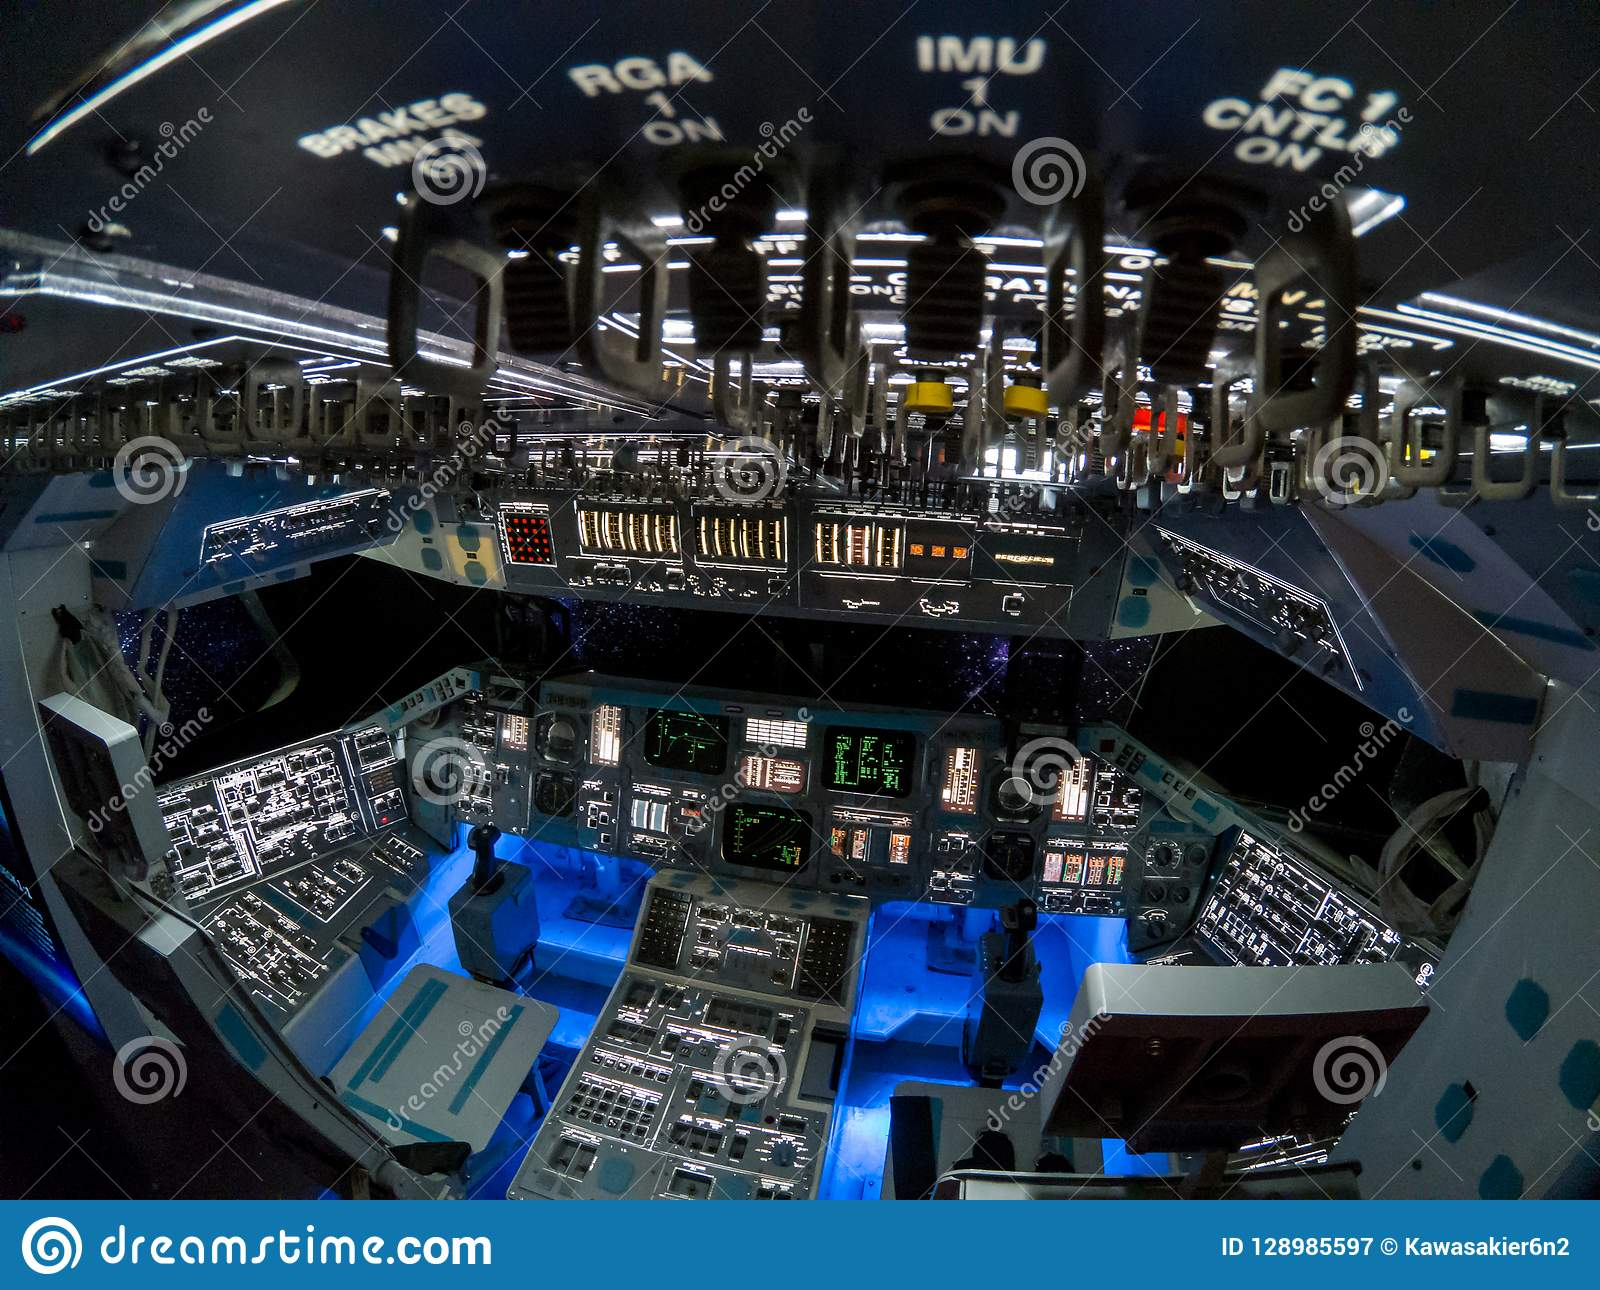 space shuttle columbia inside - photo #23